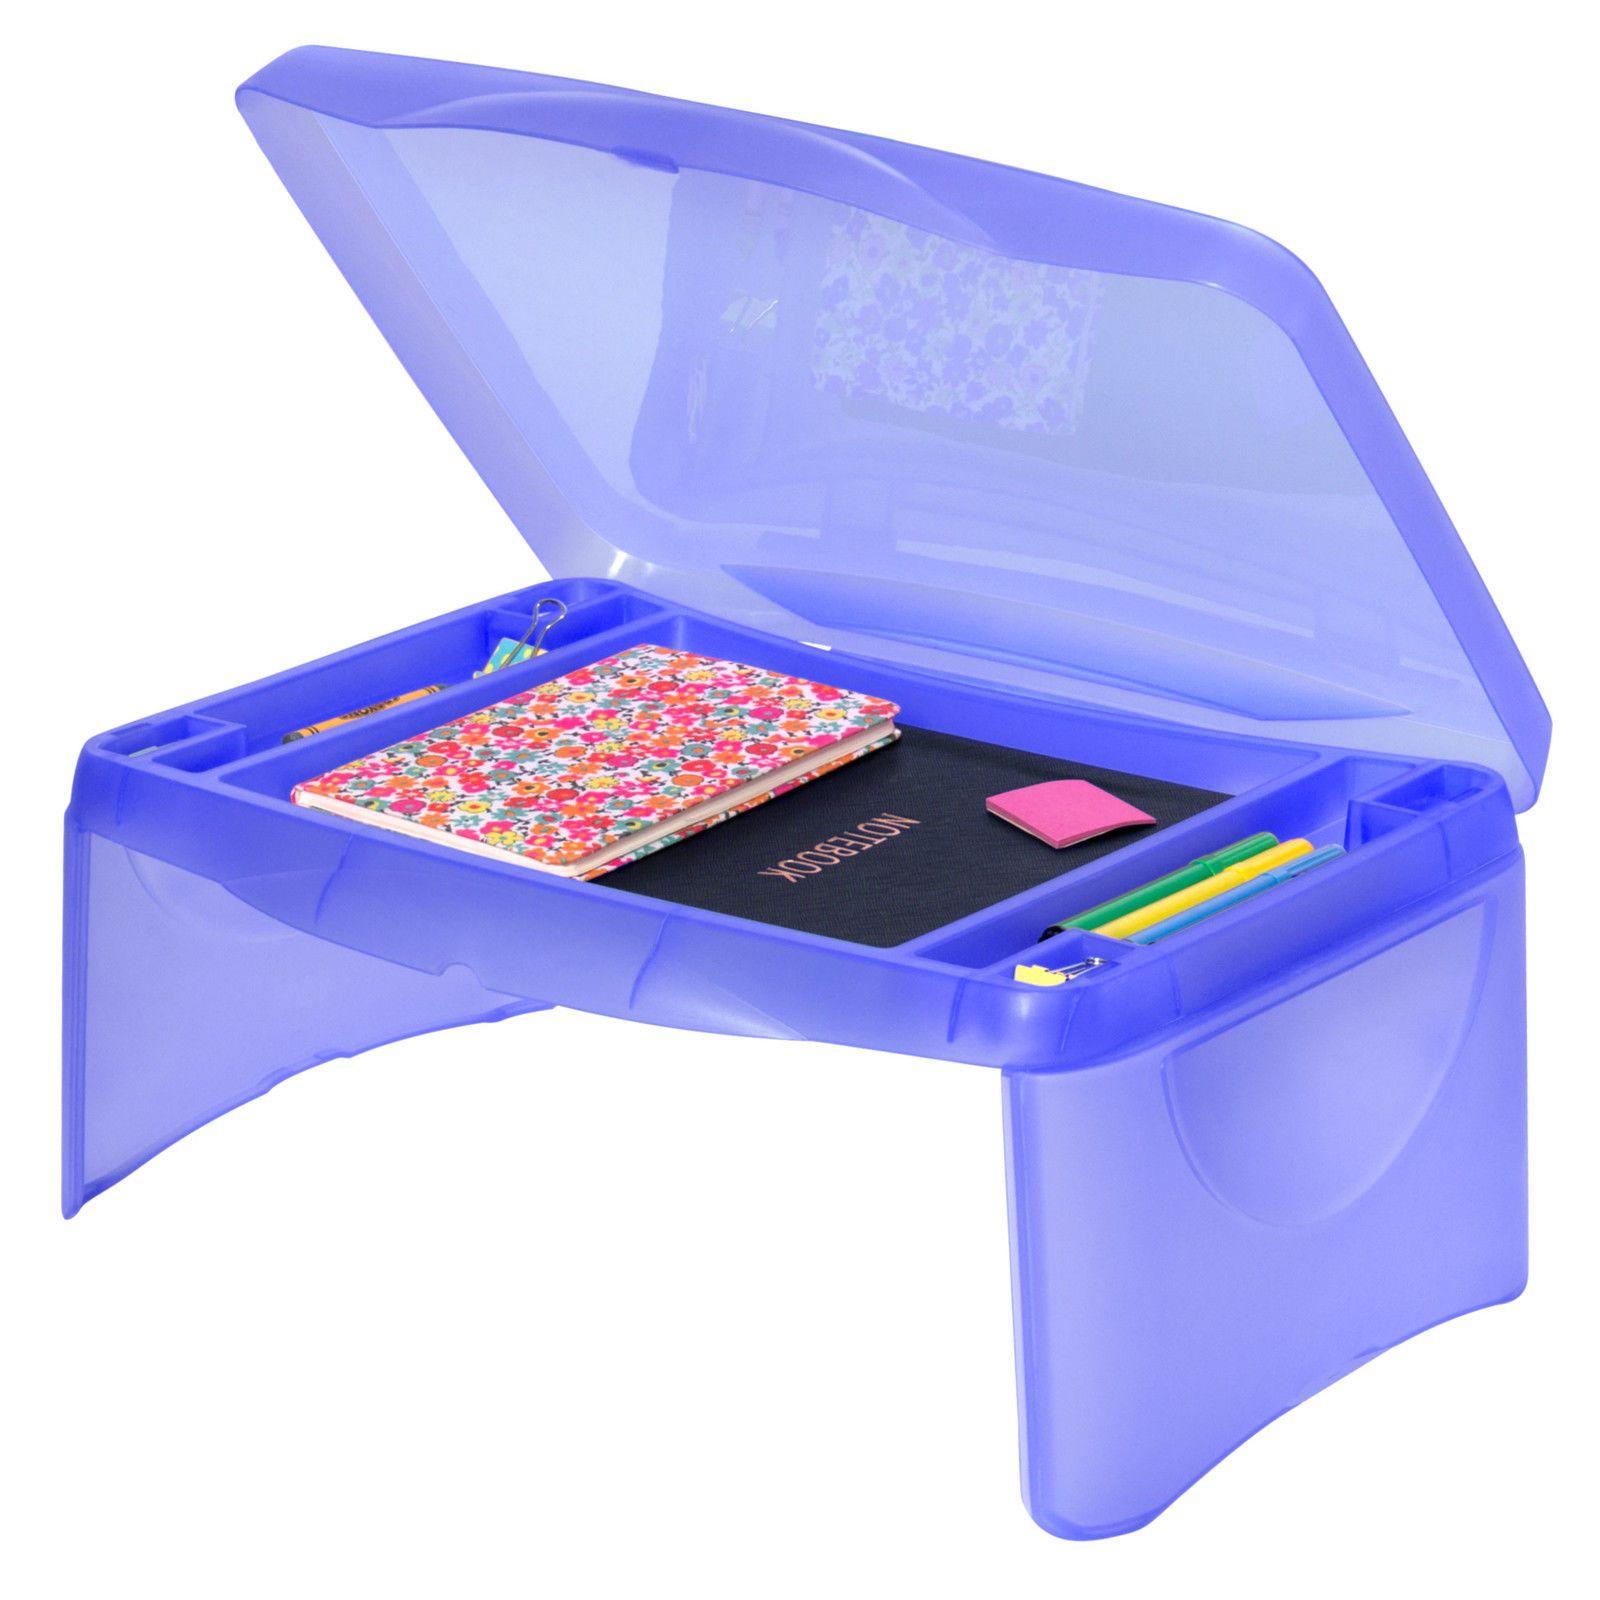 2018 Best Choice S Kids Folding Lap Desk W Storage Blue From Hongxinlin21 15 08 Dhgate Com